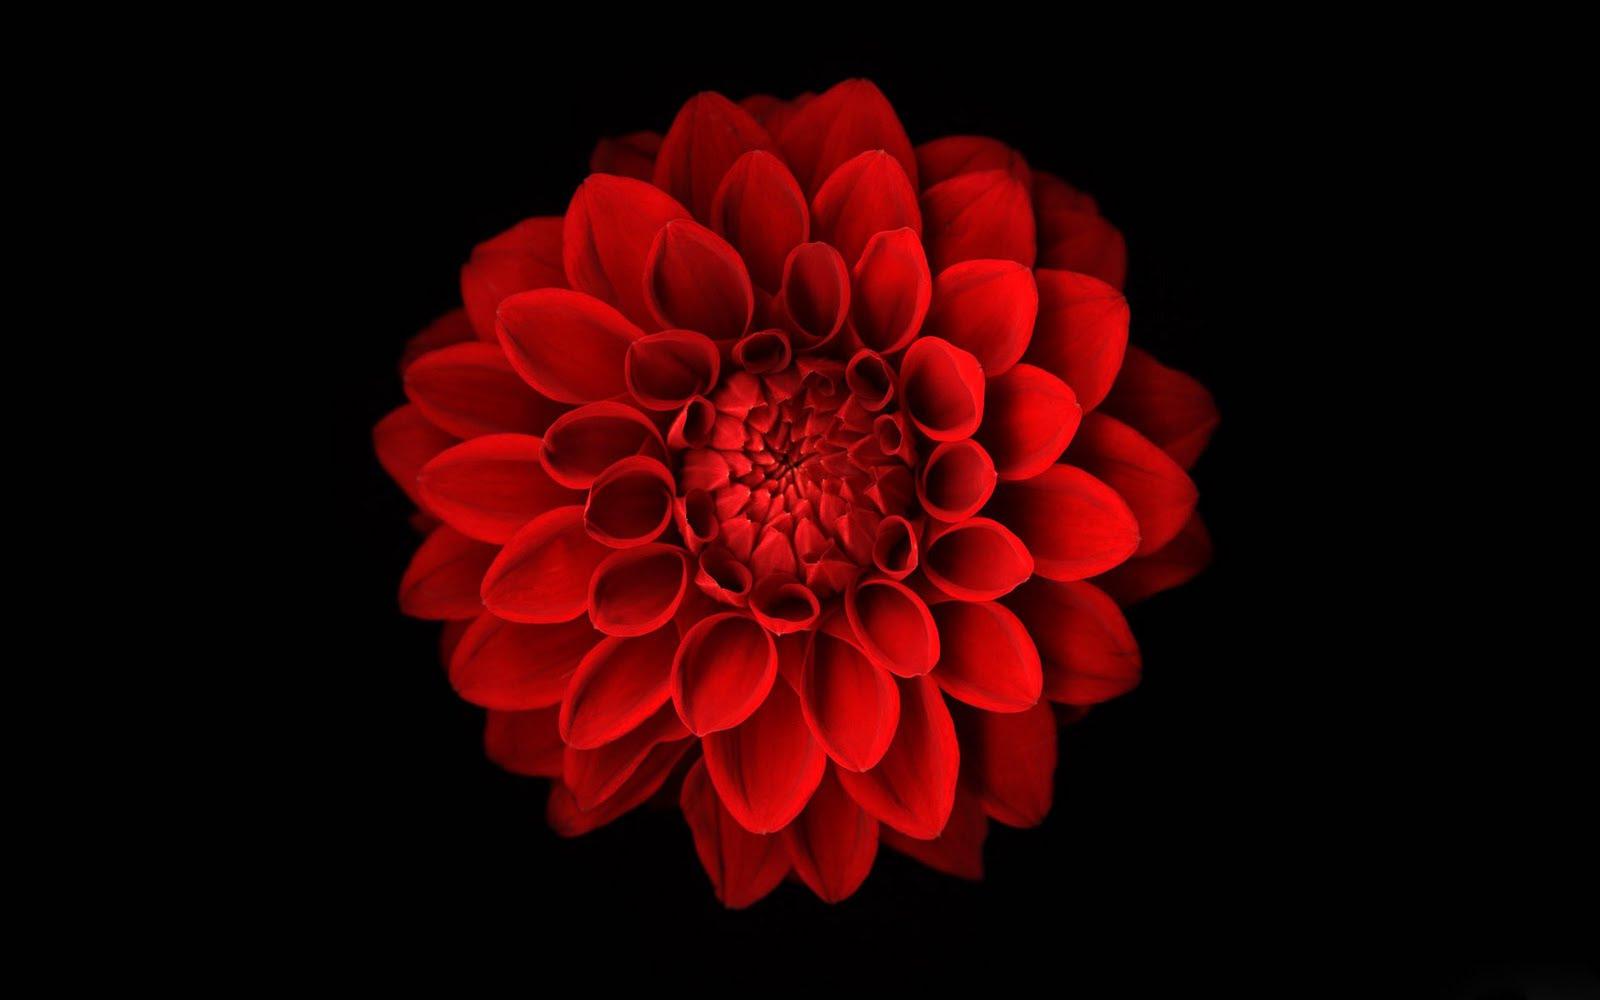 Unduh 94 Koleksi Wallpaper Black Red Flowers Gratis